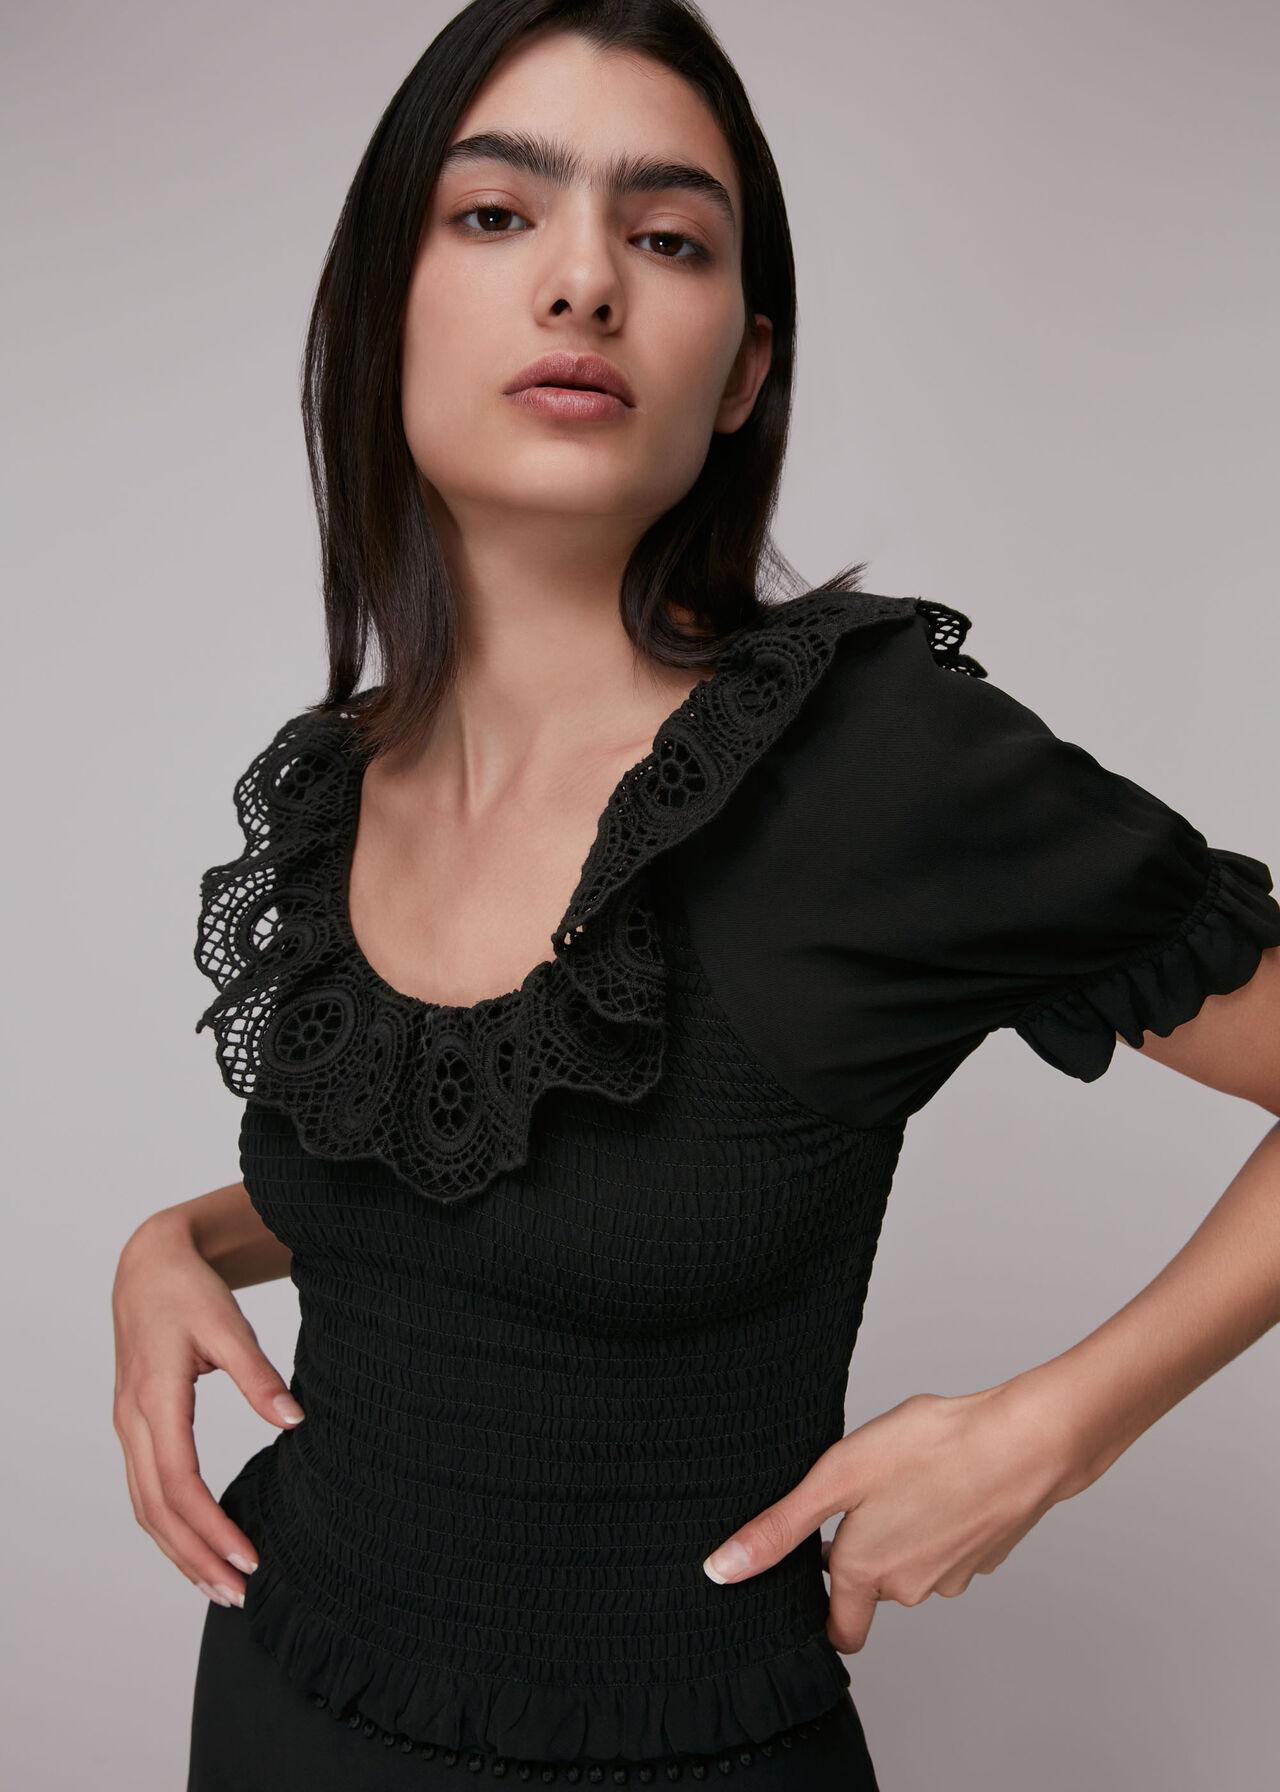 Crochet Detail Smocked Top